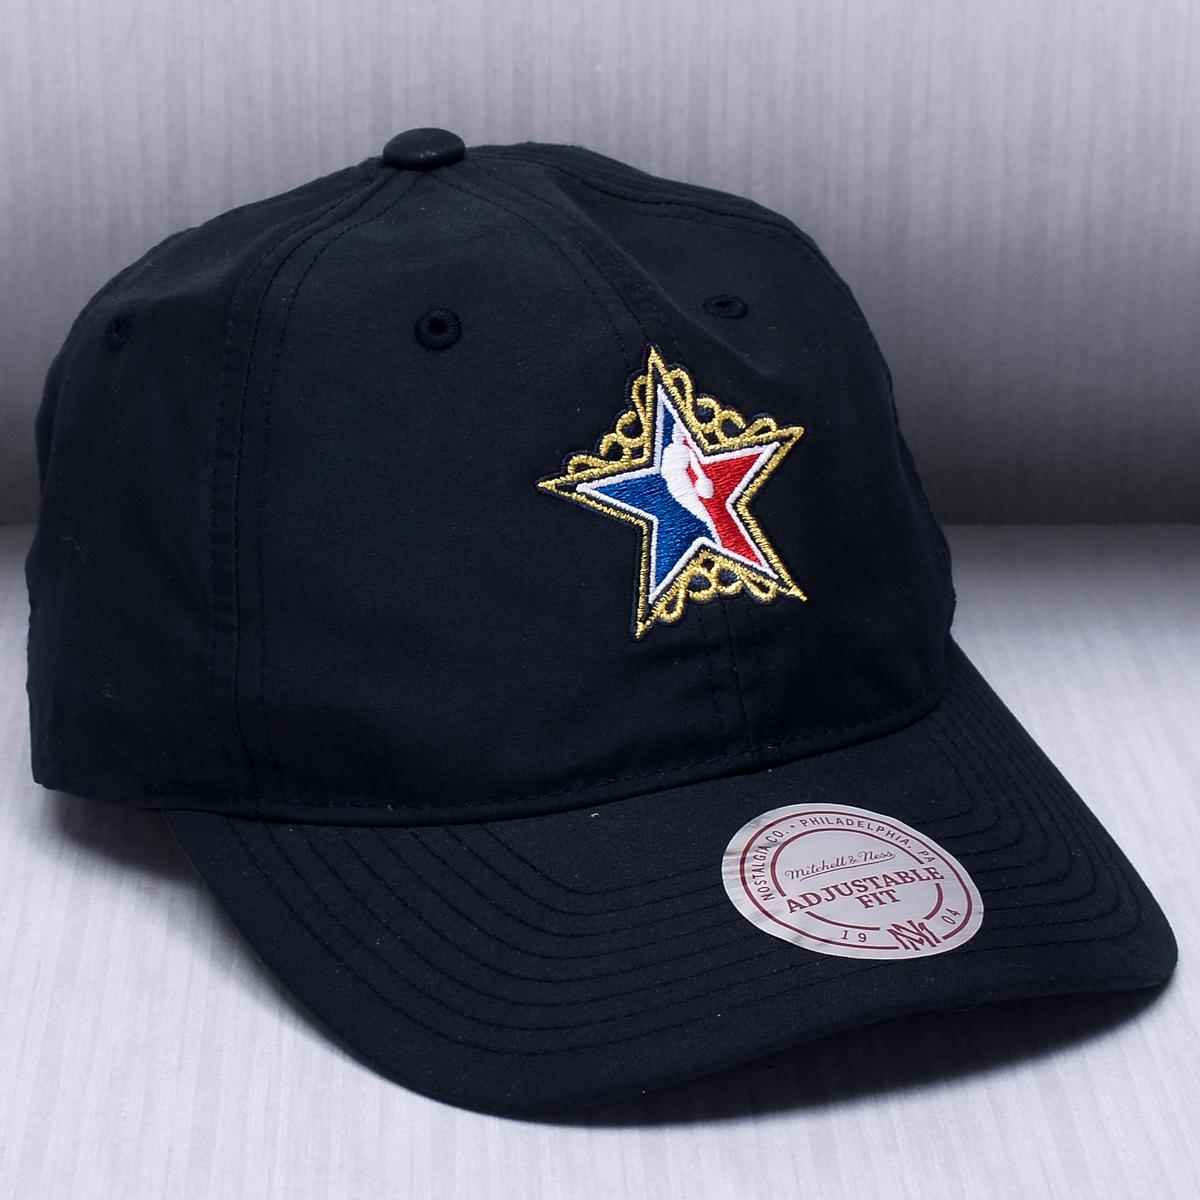 8fd9a499813 Mitchell   Ness NBA All-Star Peached Oxford Dad Cap - NBA Shop Others NBA  Clubs Merchandise - Superfanas.lt